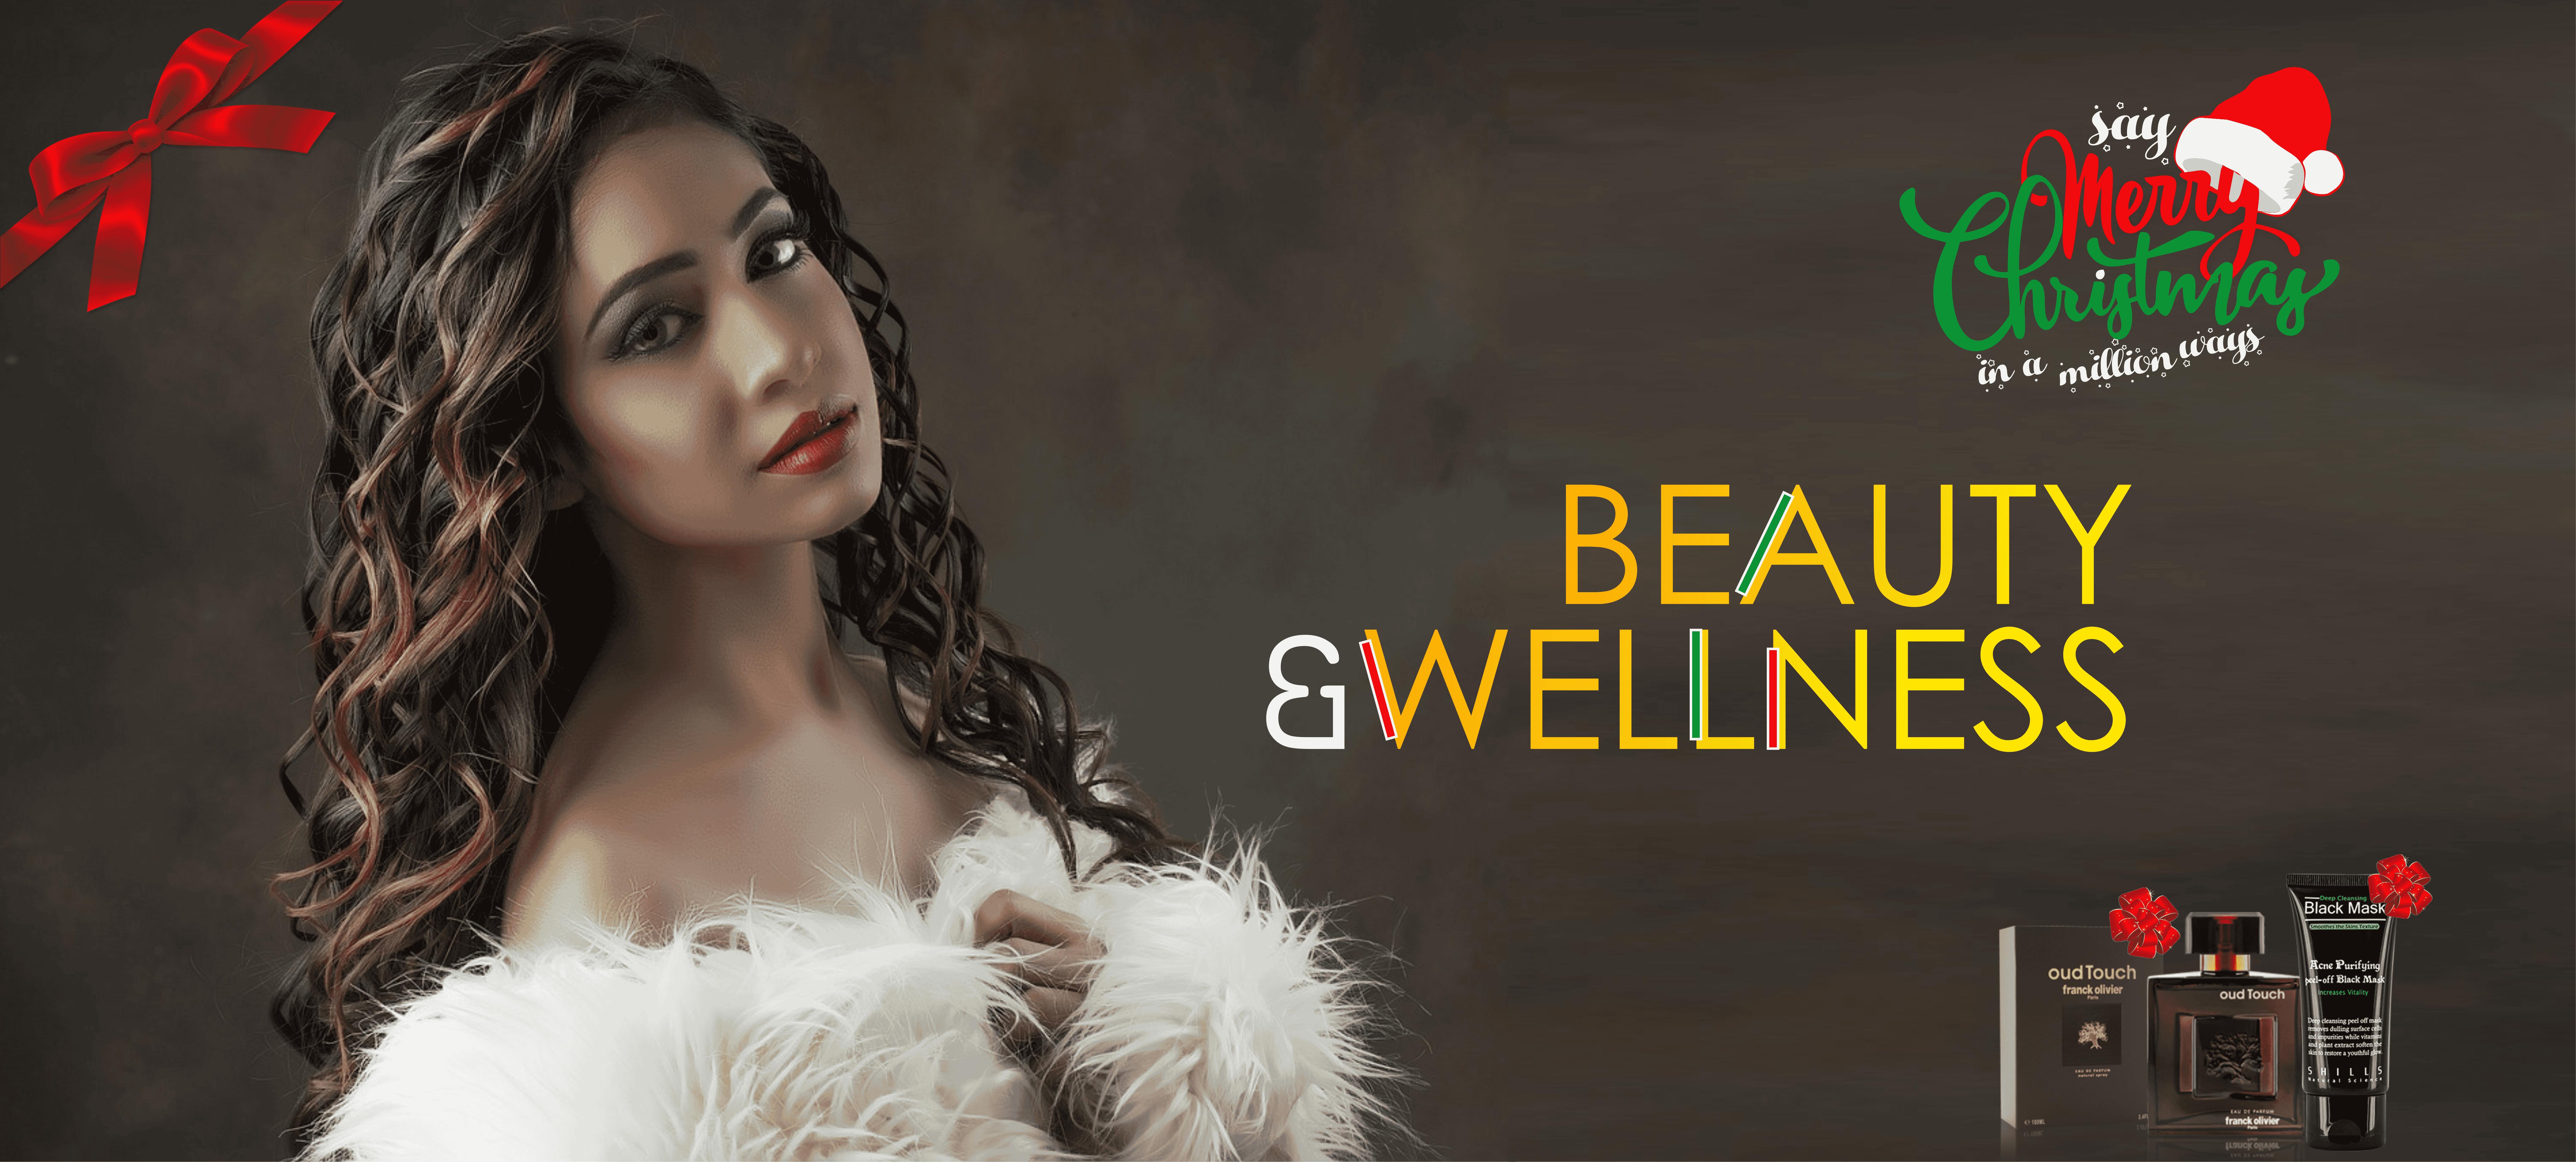 cosmetics and fragrances